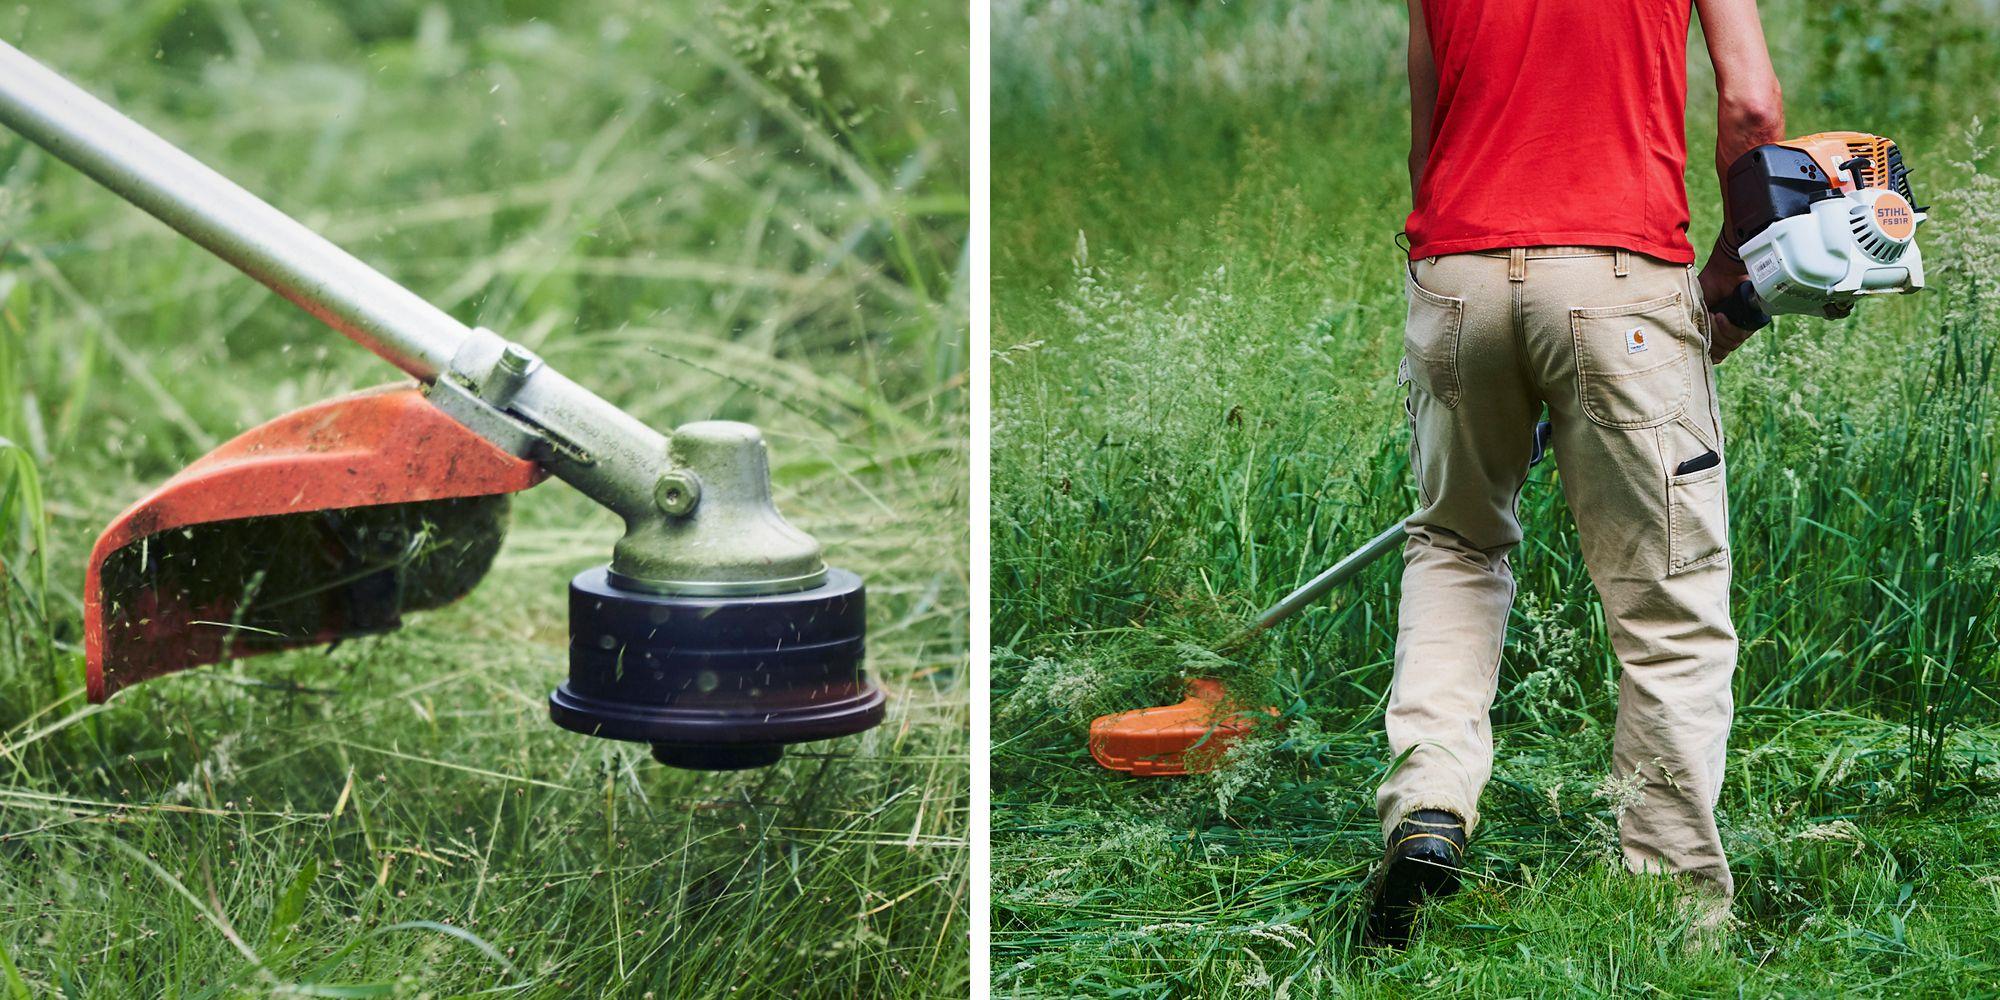 Professional Grass Shears Heavy Duty /& High Quality